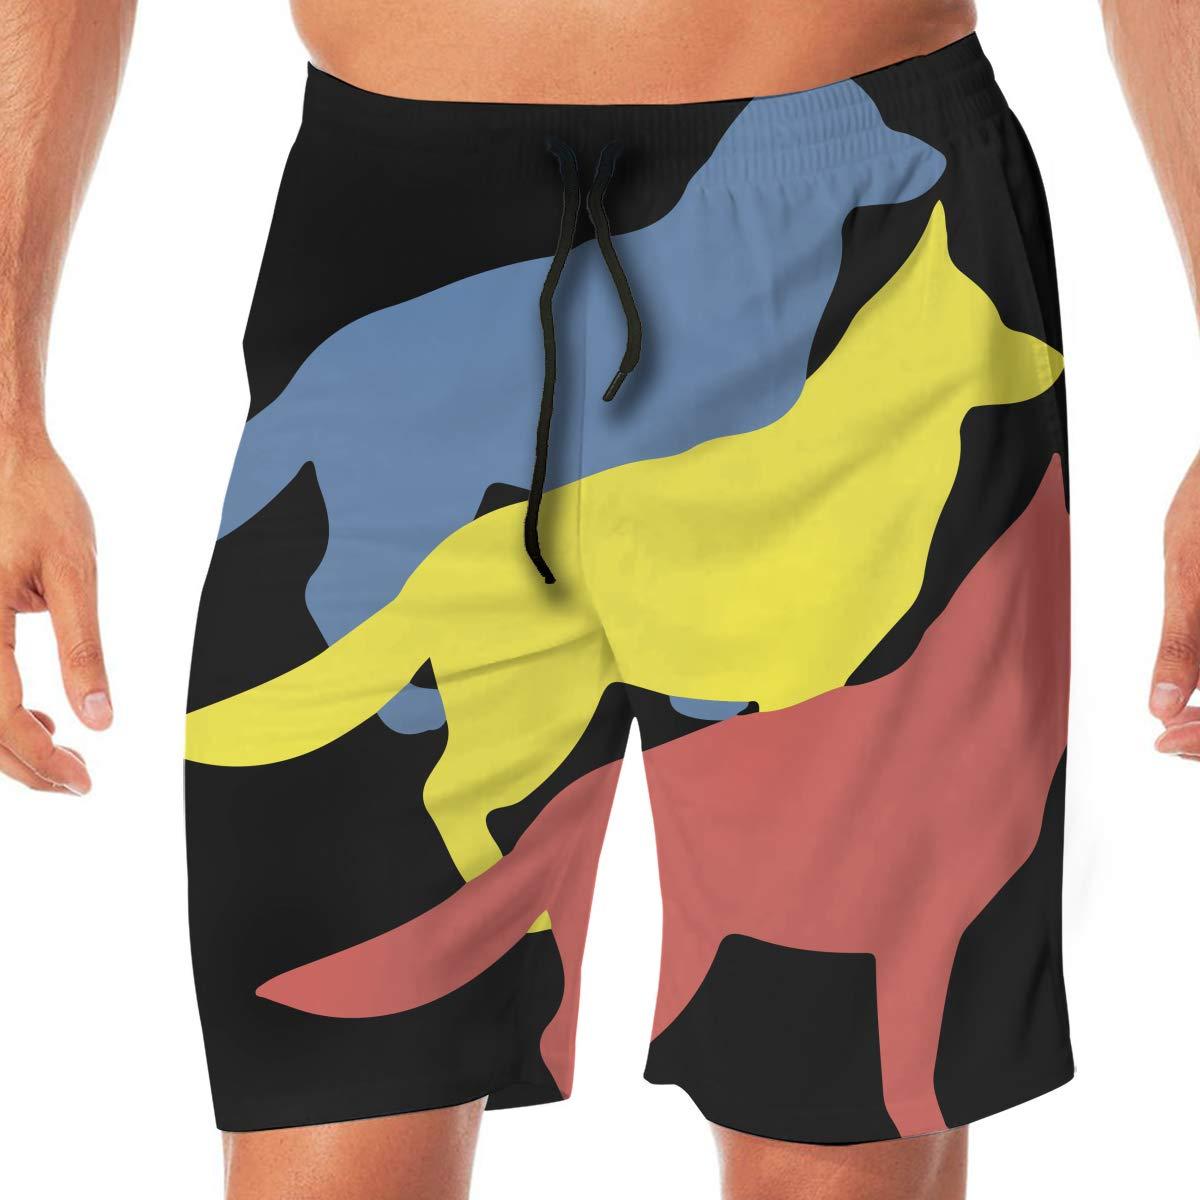 Mens Vintage Shepherd Dog Boardshorts Beach Pants No Mesh Lining